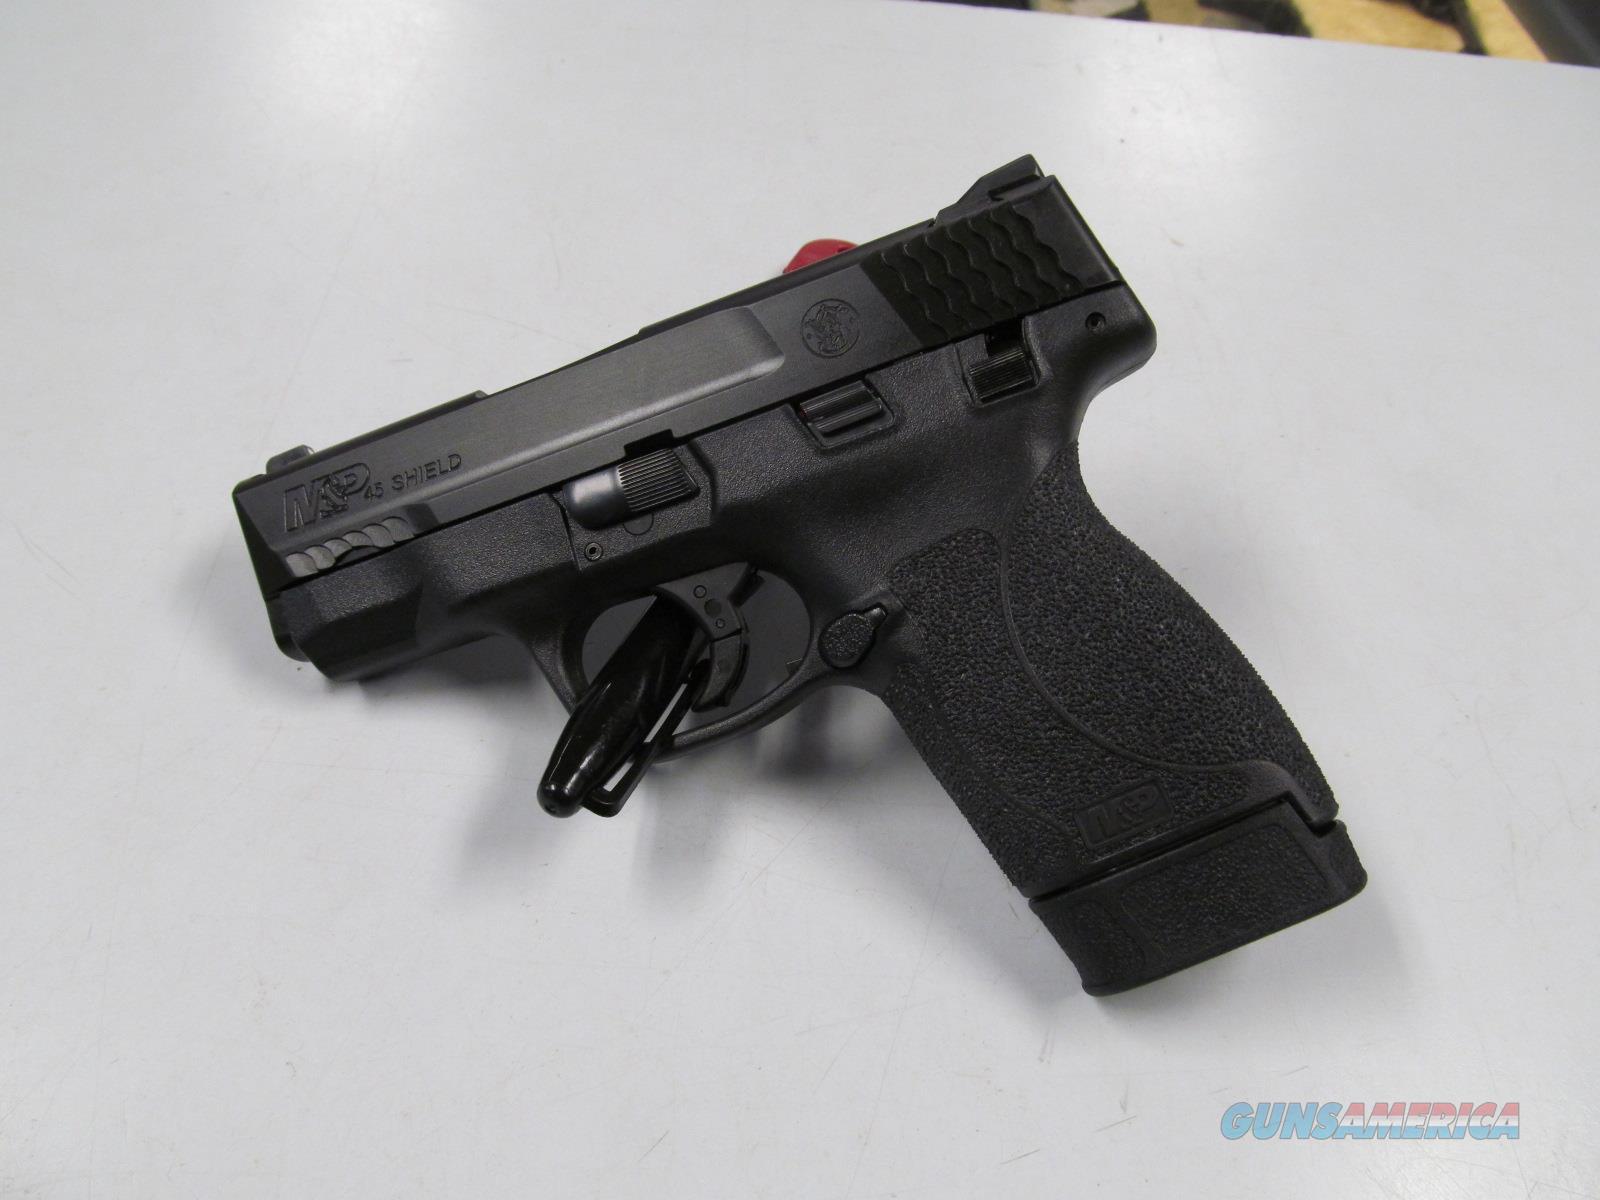 Smith & Wesson M&P45 Shield (180022)  Guns > Pistols > Smith & Wesson Pistols - Autos > Shield